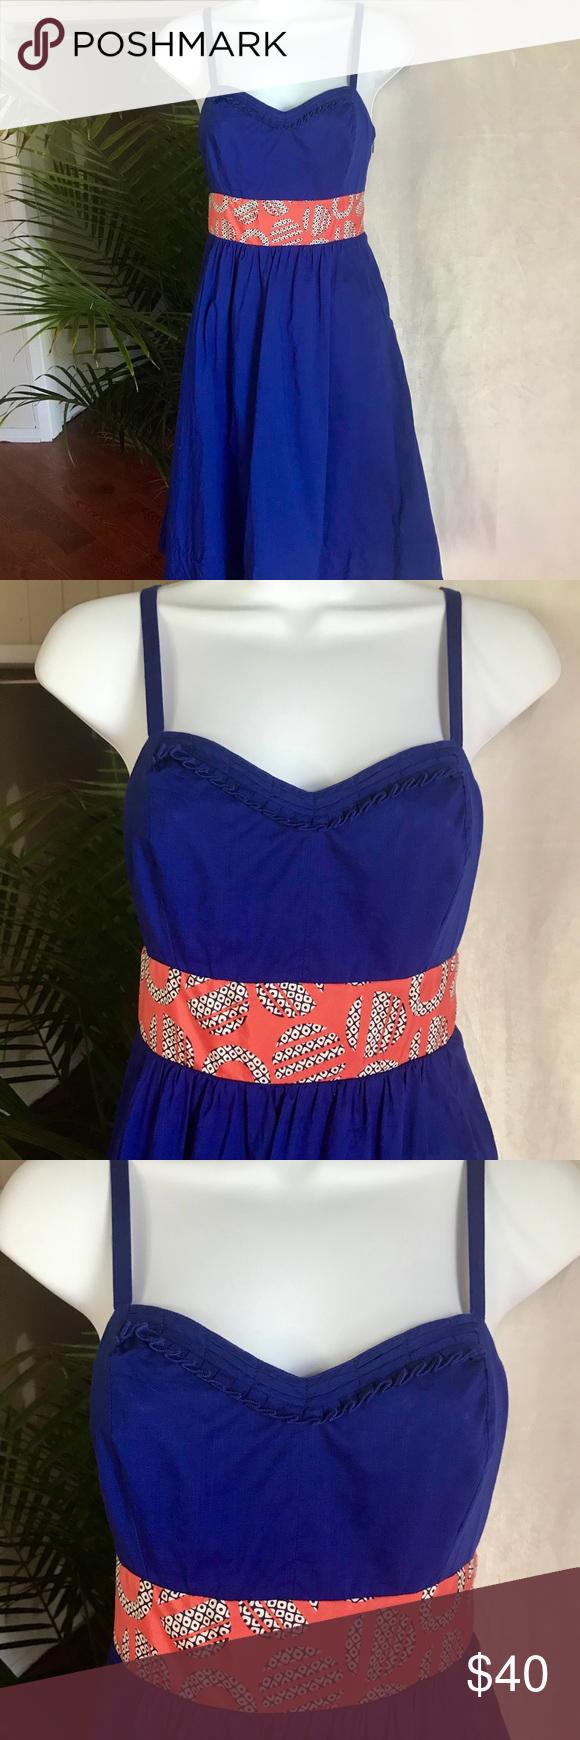 Anthropologie Blue Midi Dress With Pockets Tie Blue Midi Dress Midi Dress Dresses [ 1740 x 580 Pixel ]